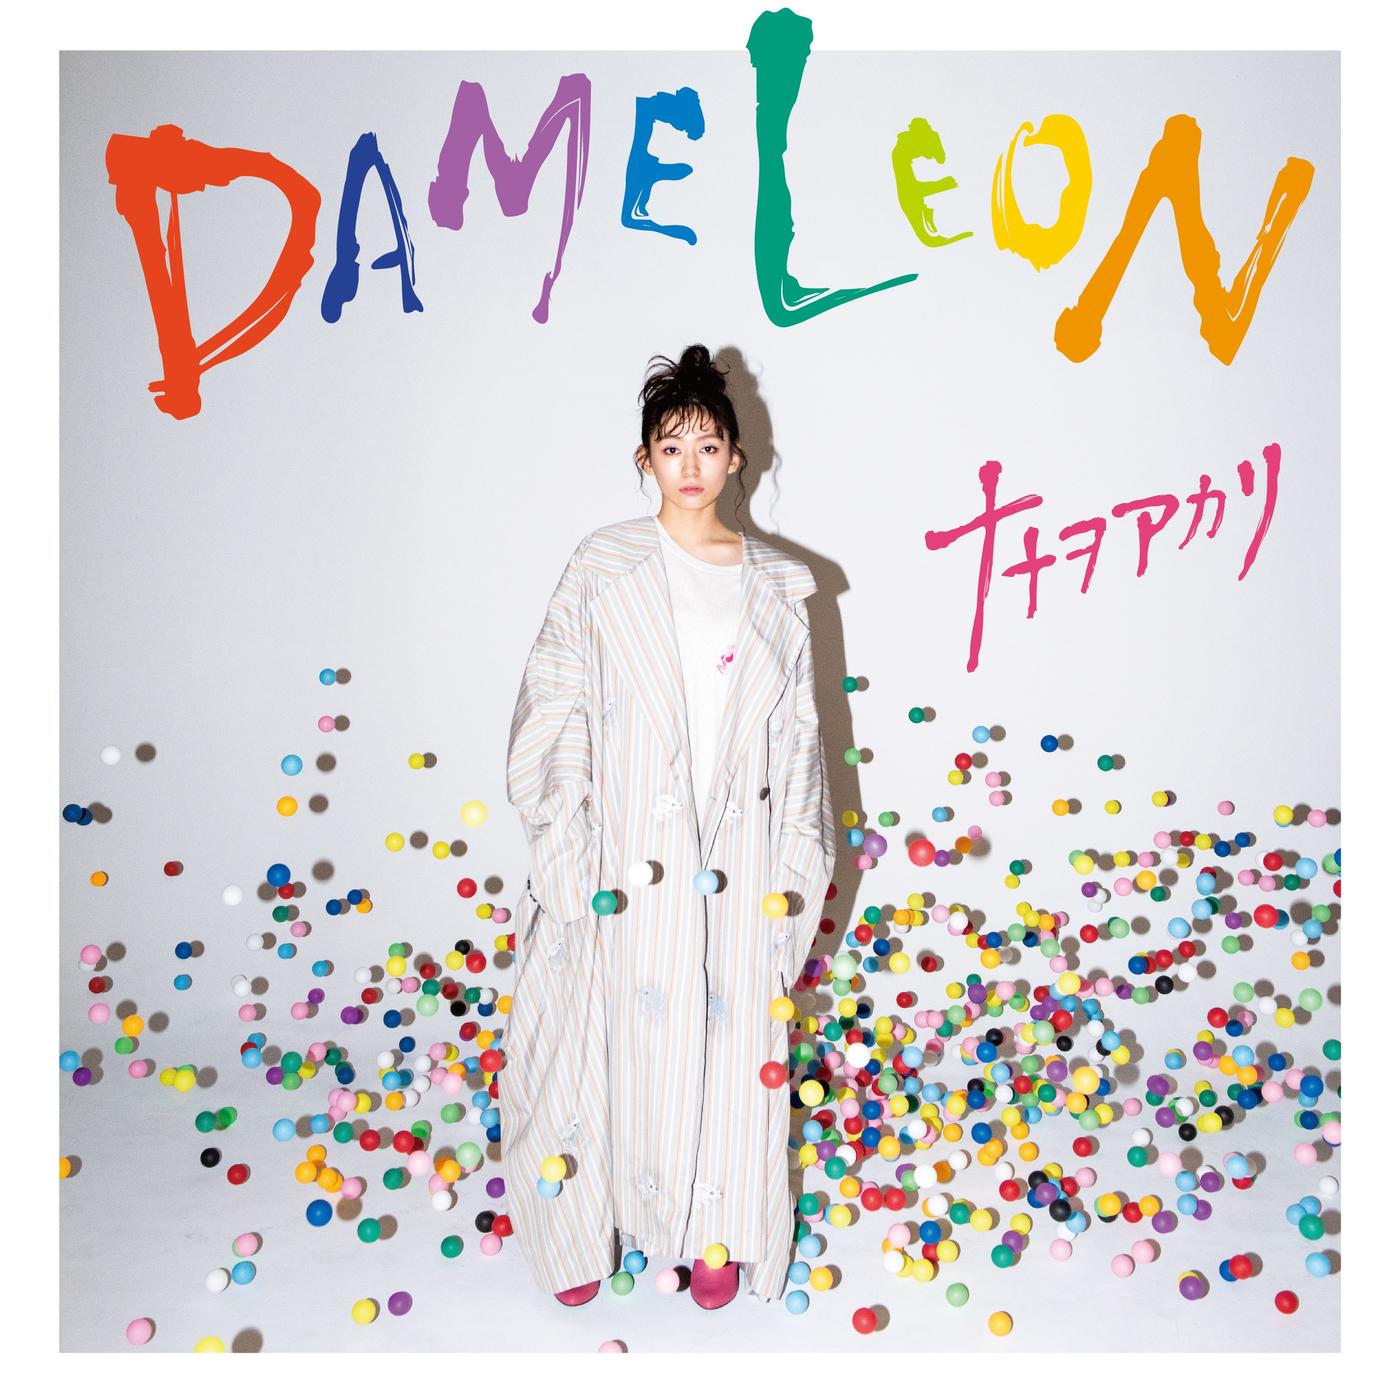 DAMELEON - Nanawoakari